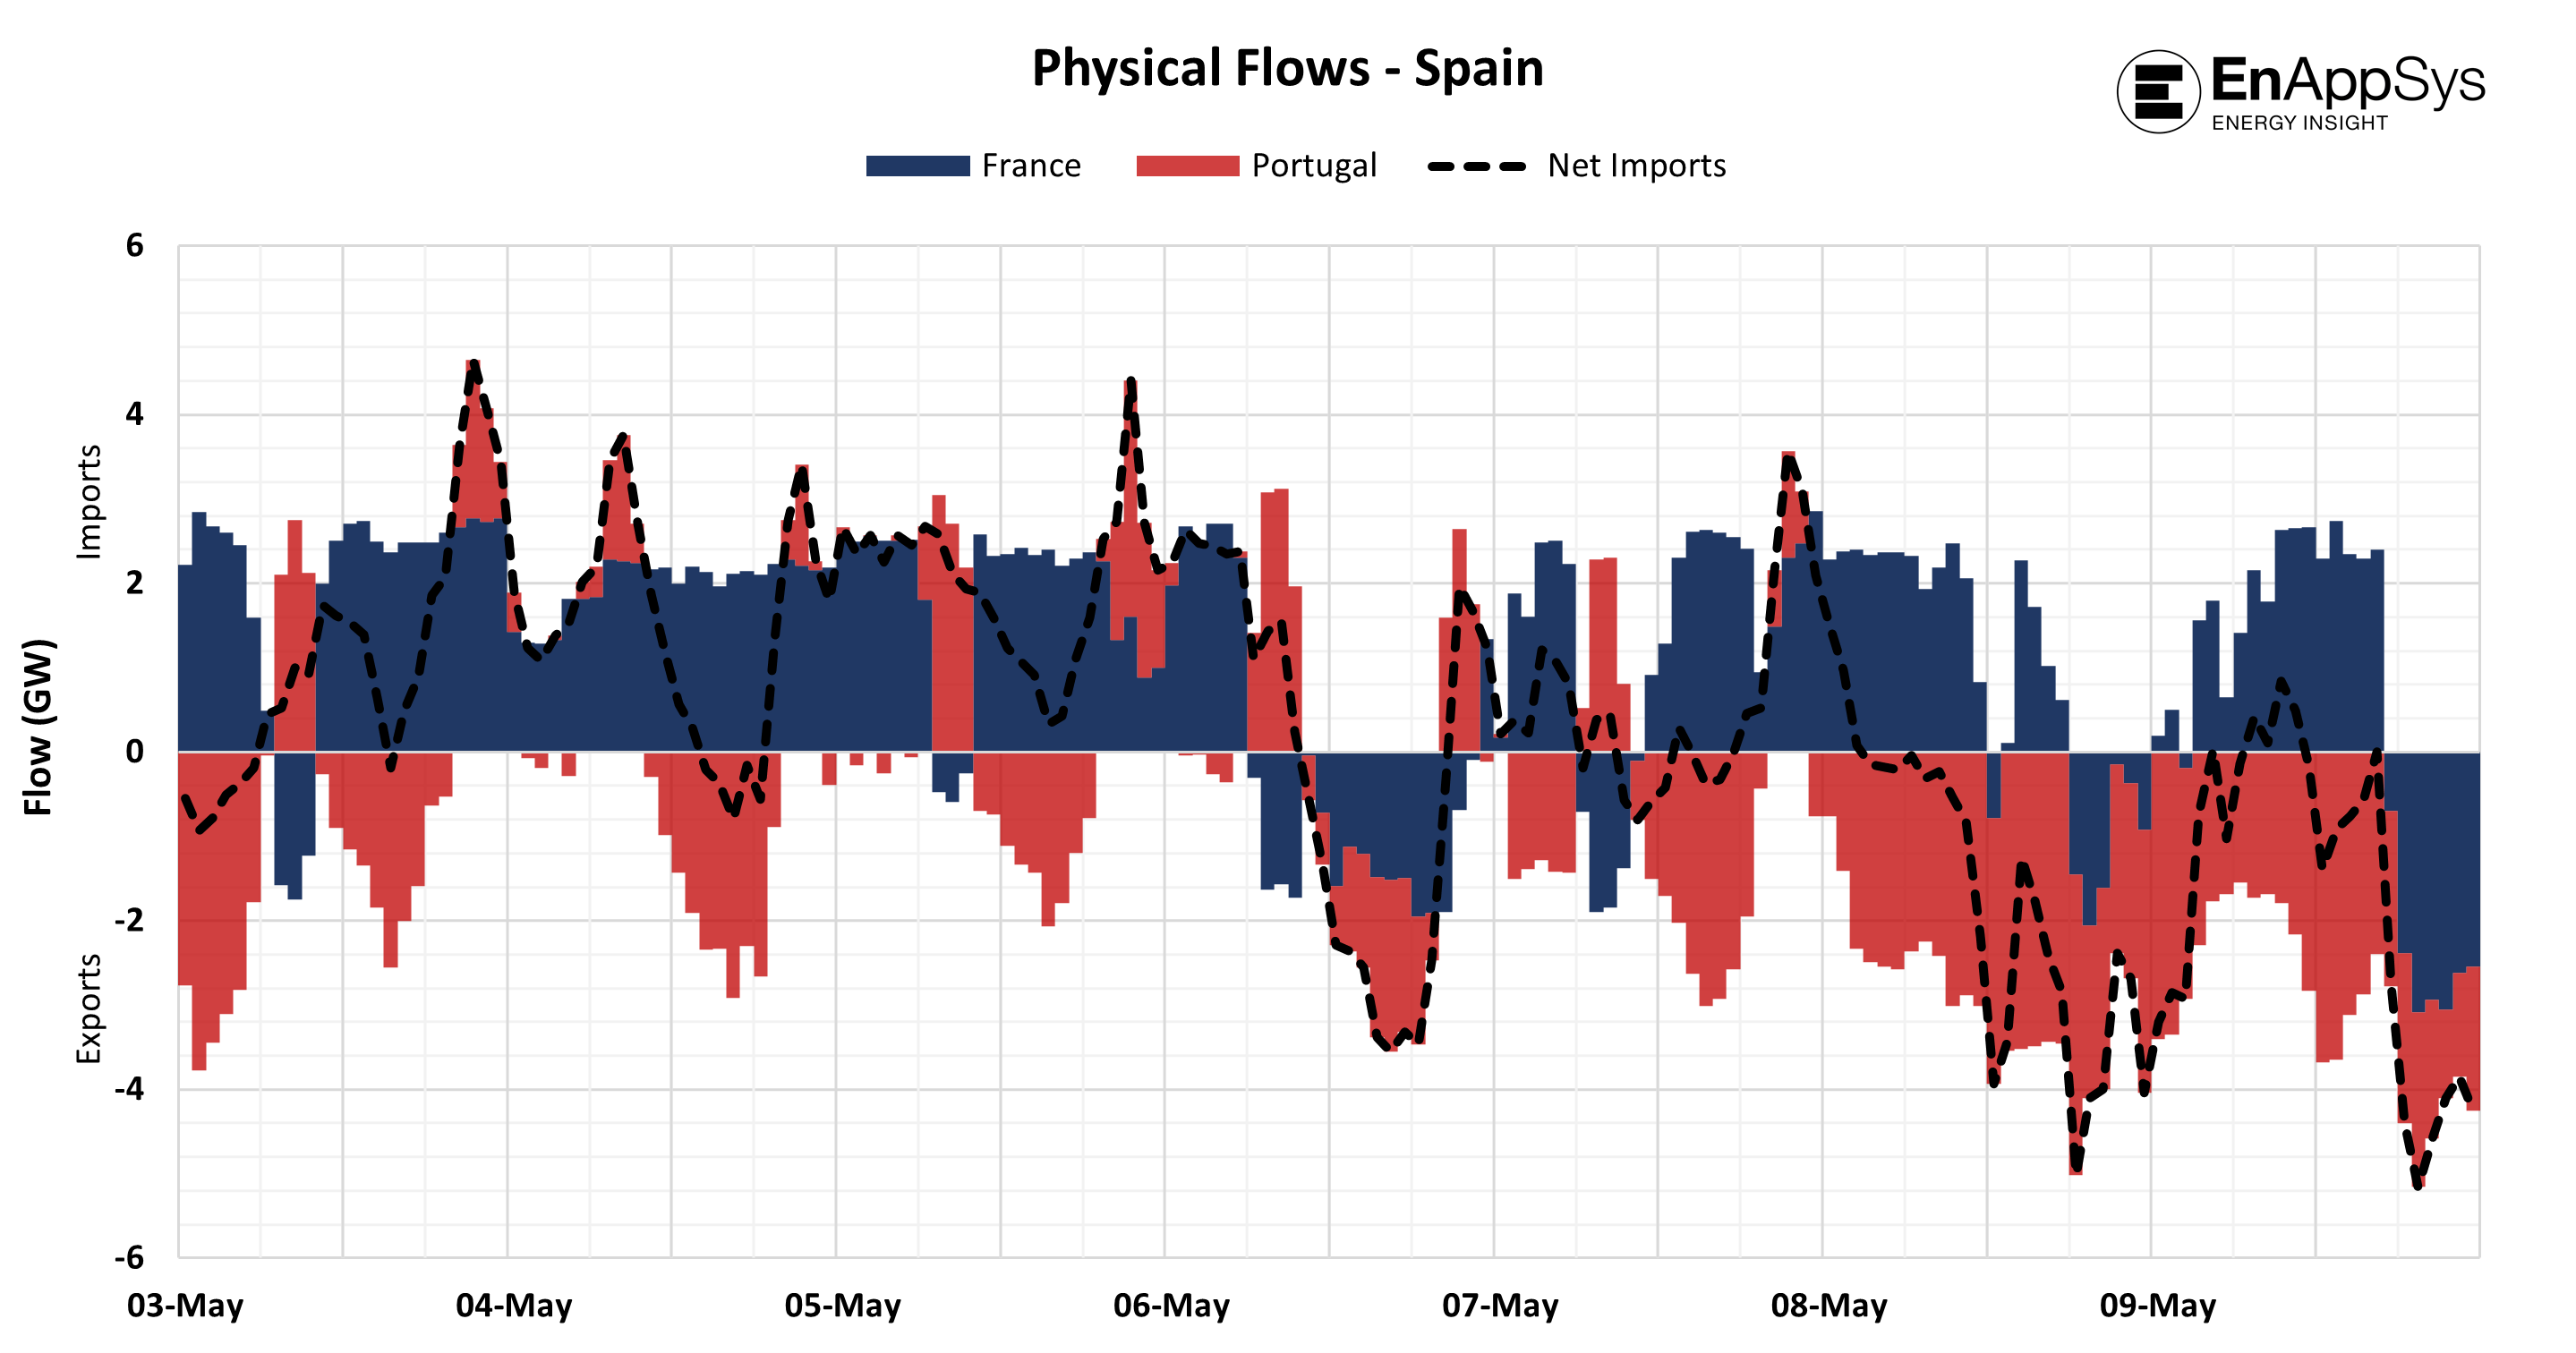 Figure 2: Physical Flows - Spain